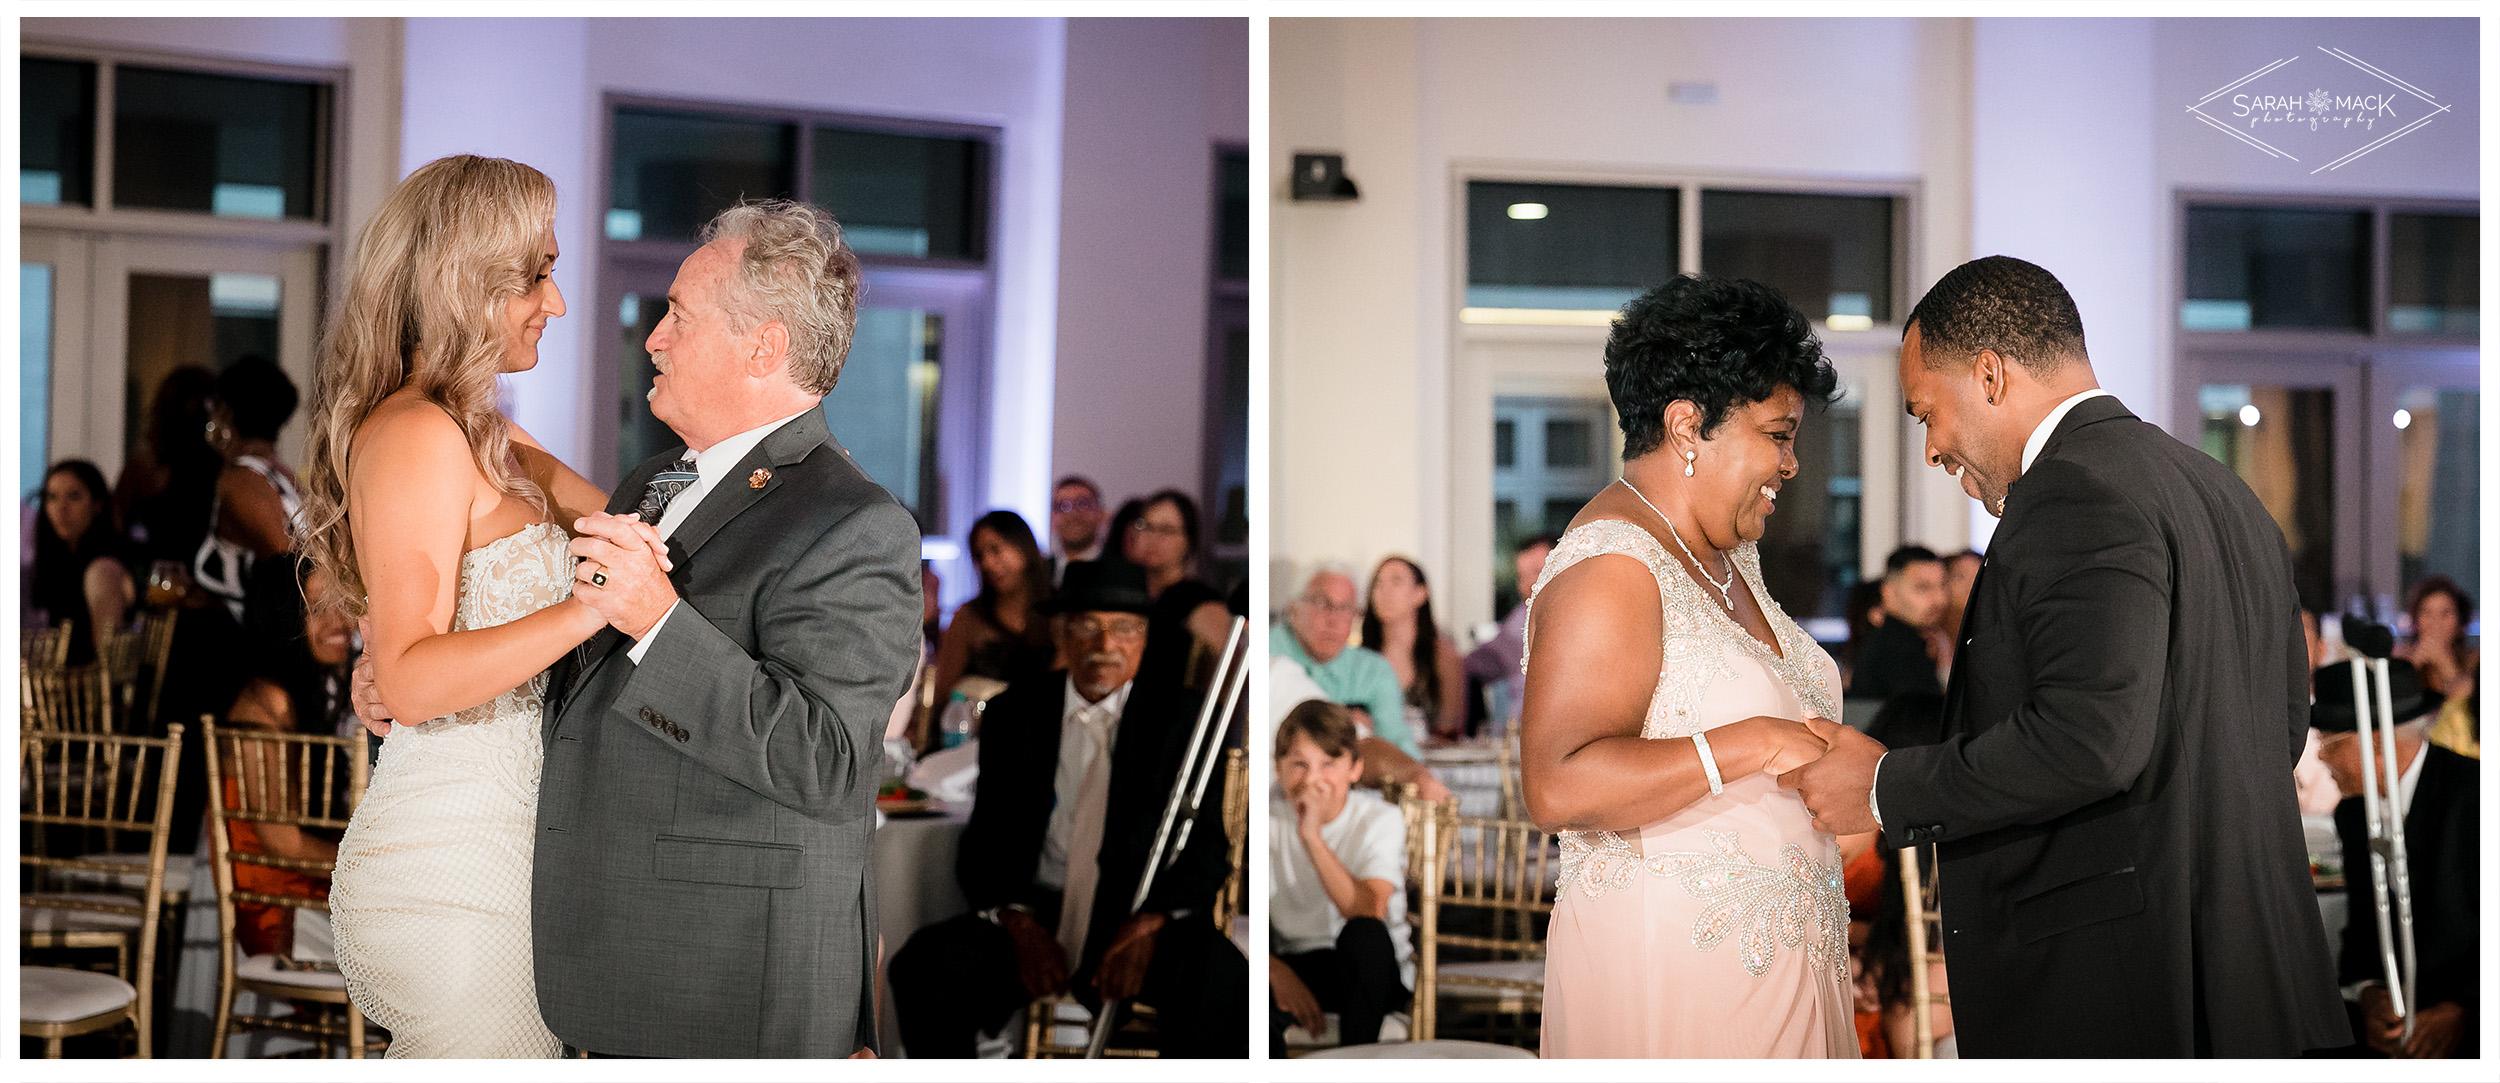 MK-Santa-Monica-Catholic-Church-Wedding-Photography-54.jpg